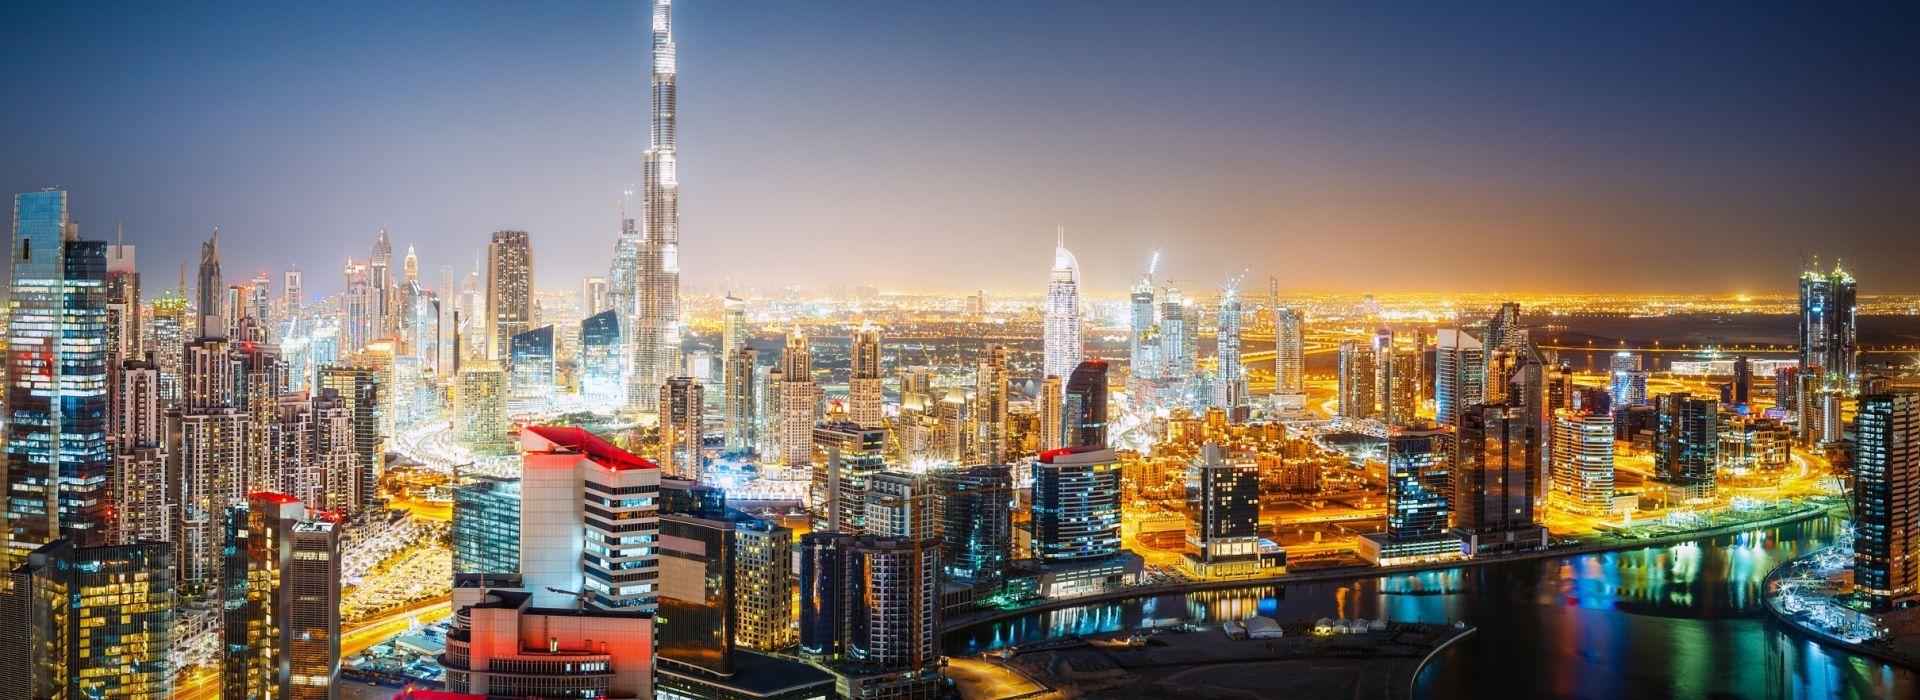 Beach, romance, getaways and relaxation Tours in Dubai